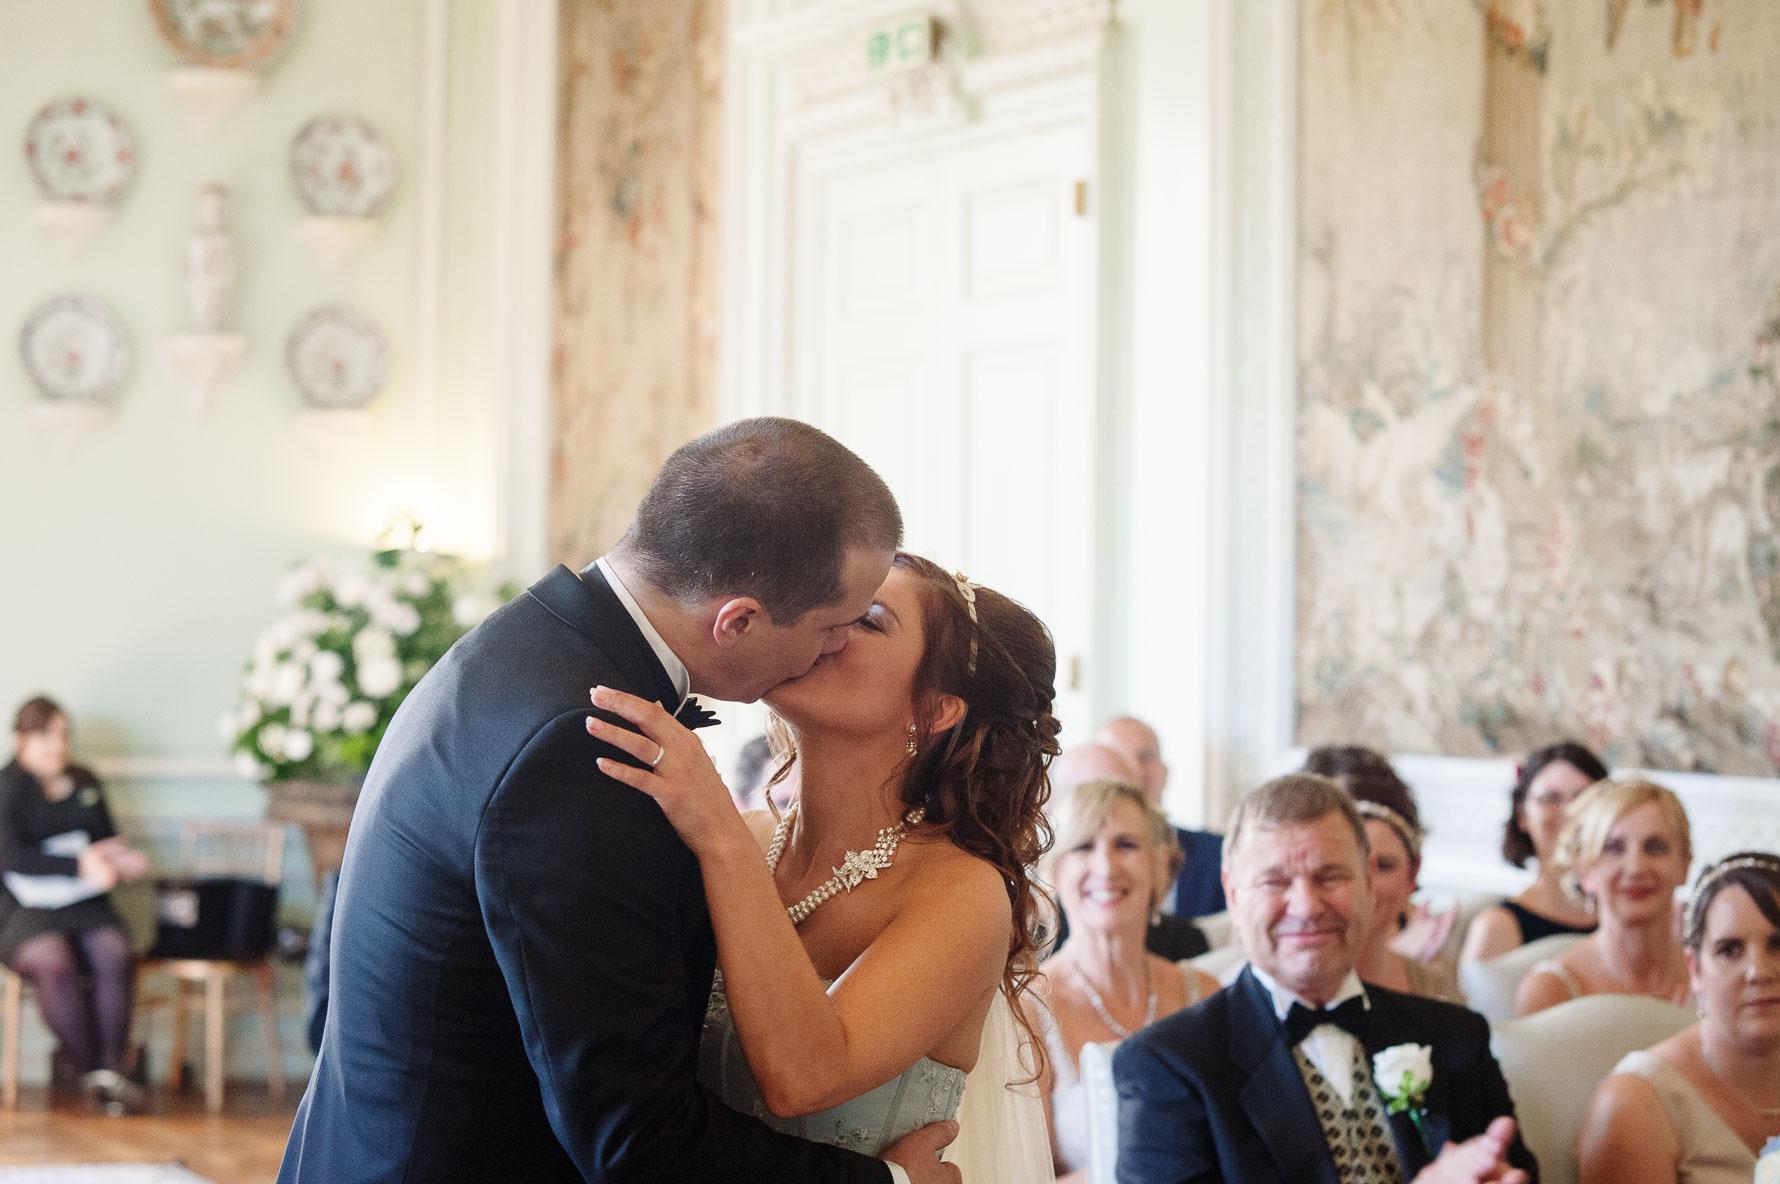 Leeds Castle Wedding20-20140919 0587